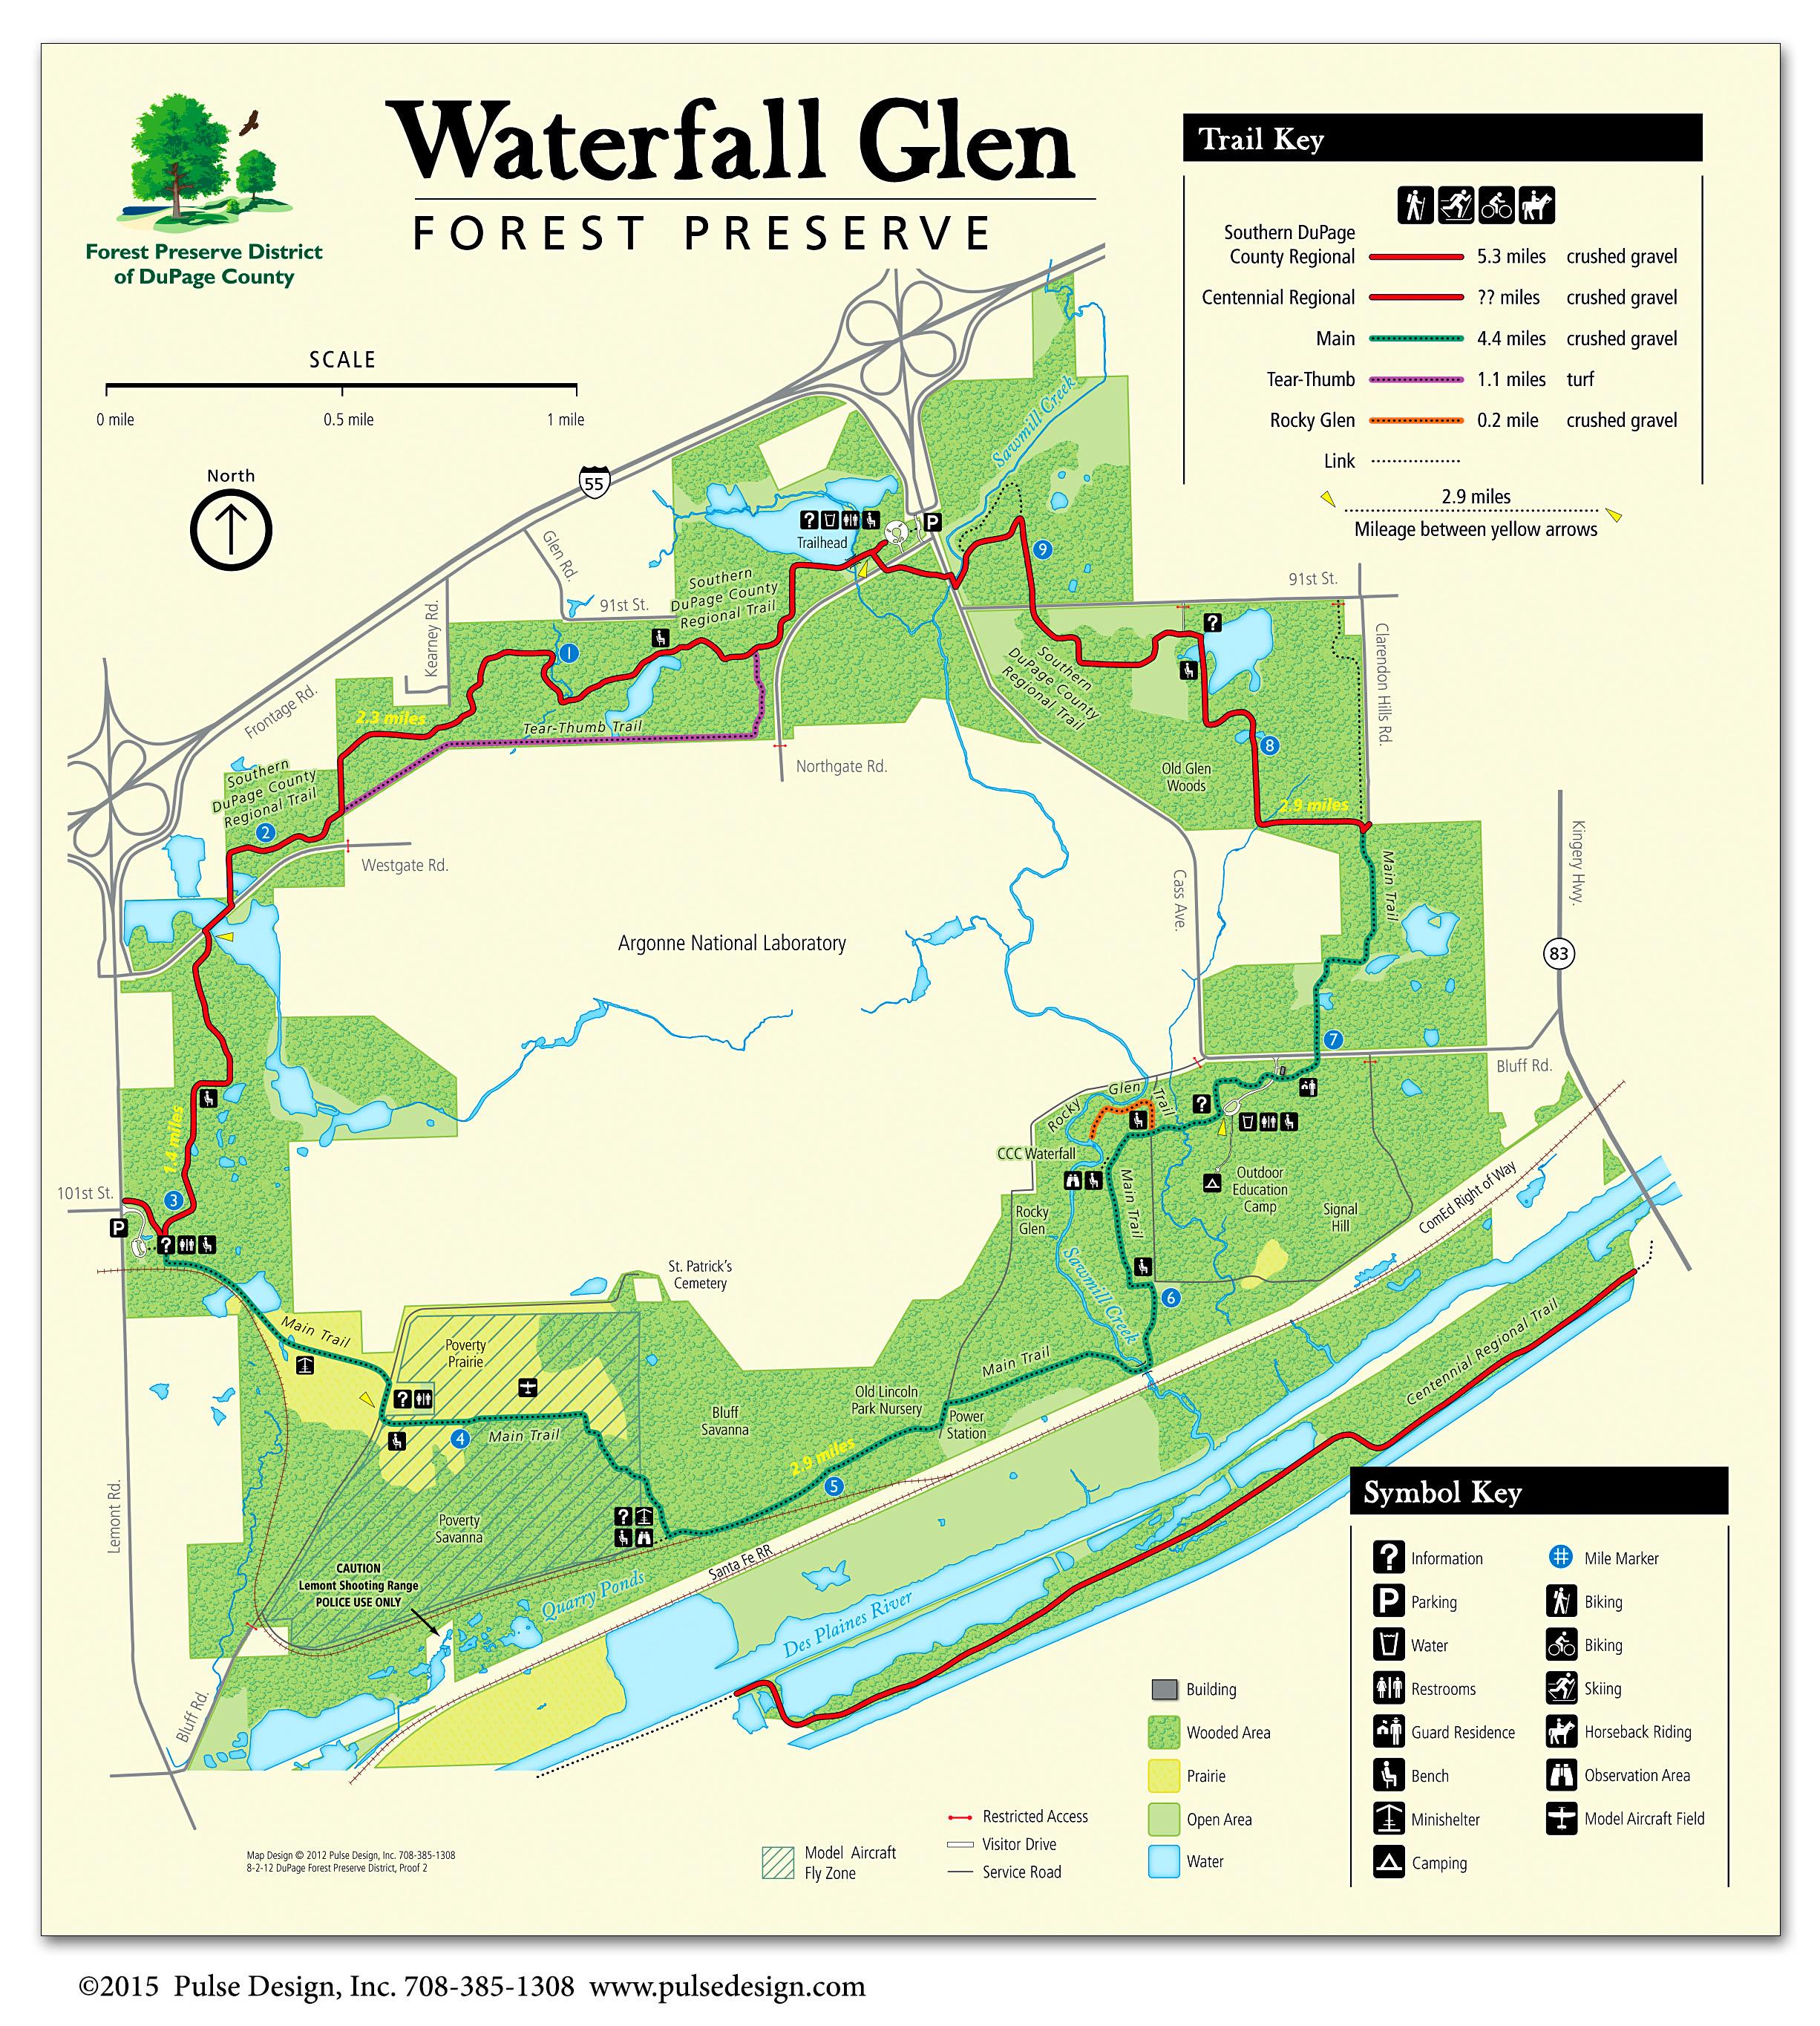 map-forest-preserve-waterfall-glen-pulse-design-inc.jpg